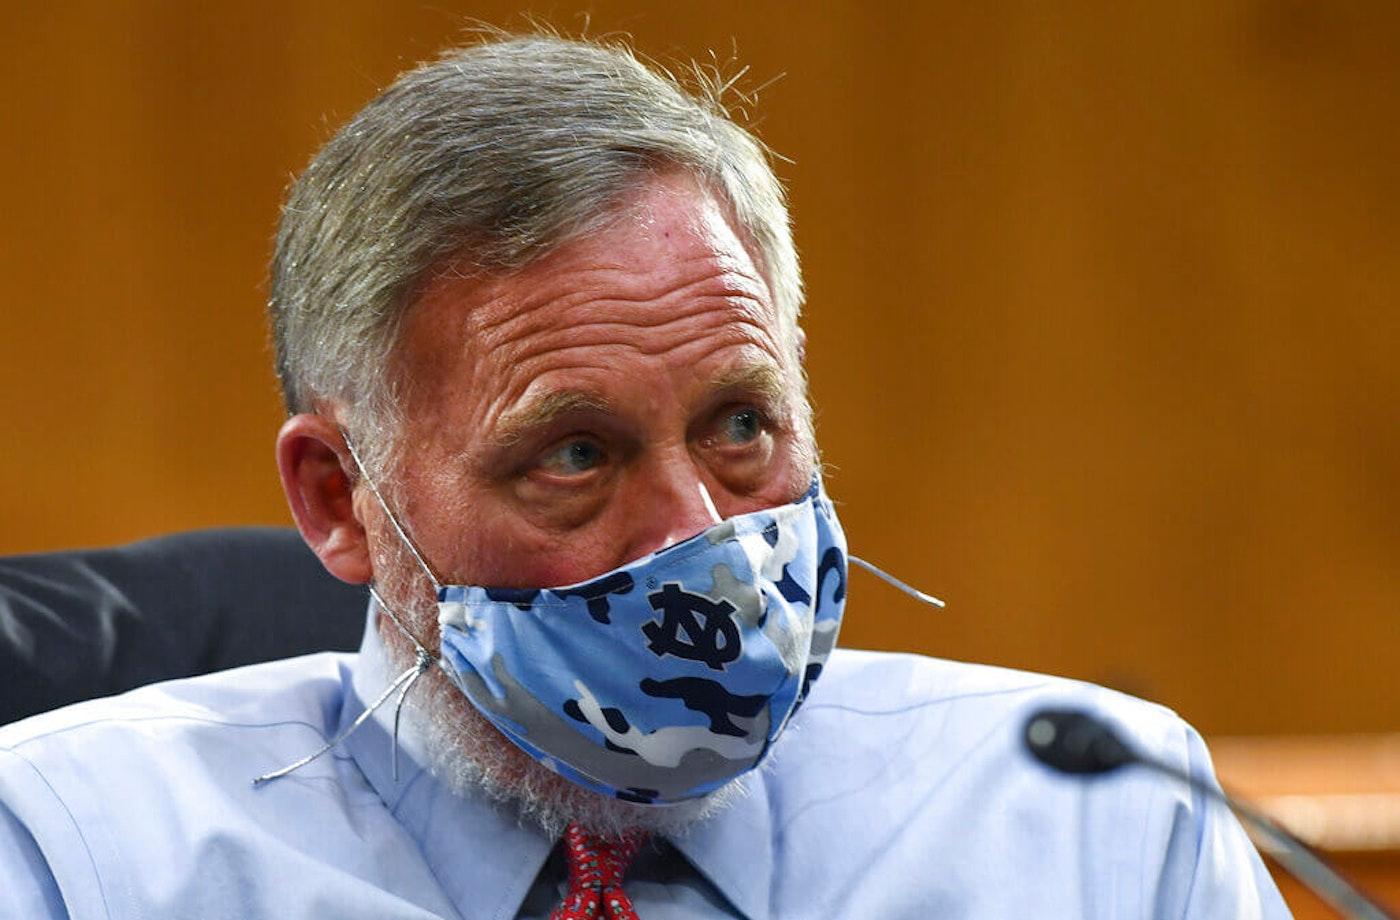 Senator Burr steps down